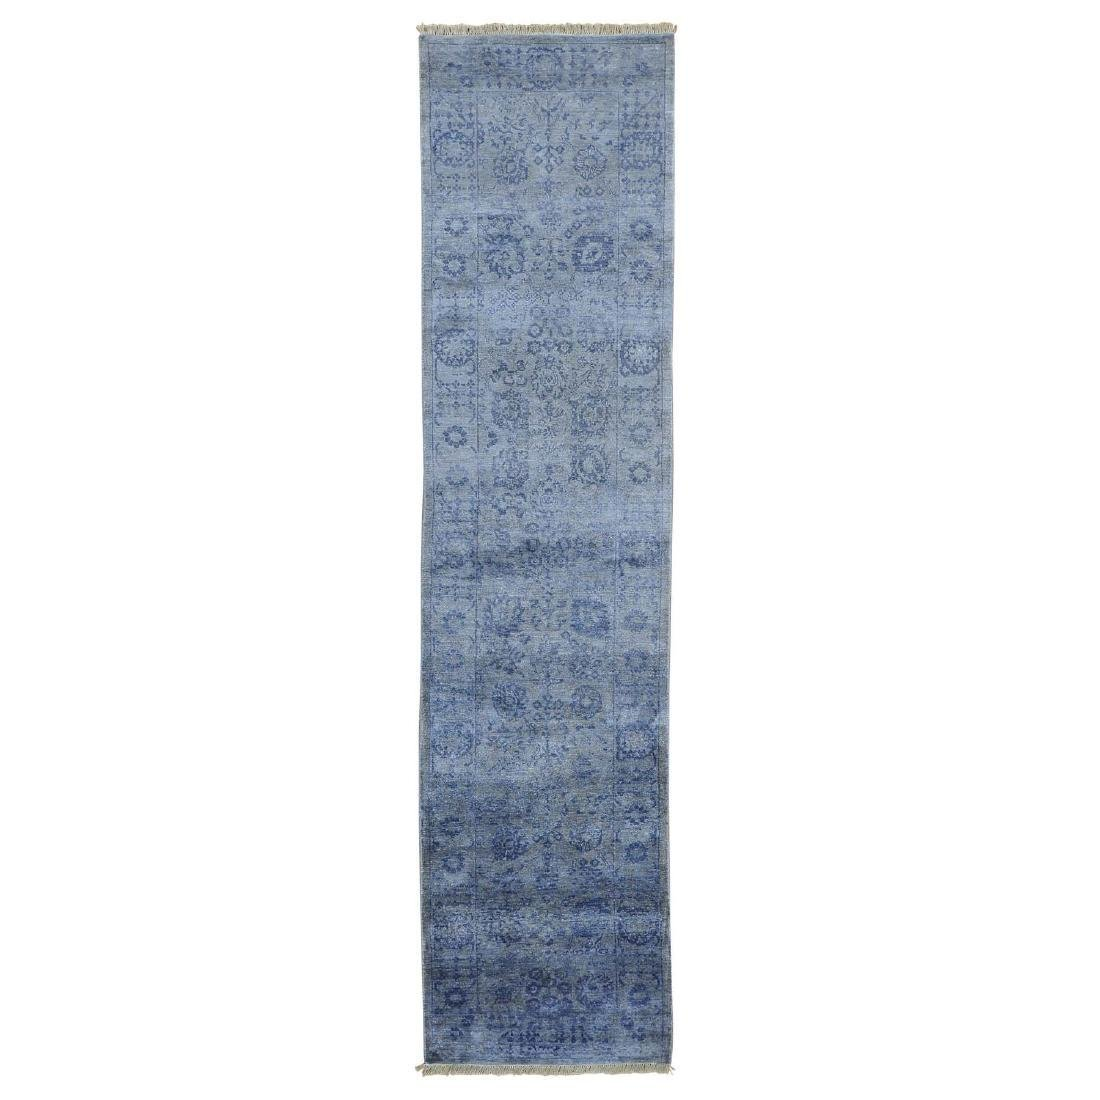 Runner Wool and Silk Tone on Tone Tabriz Handmade Rug